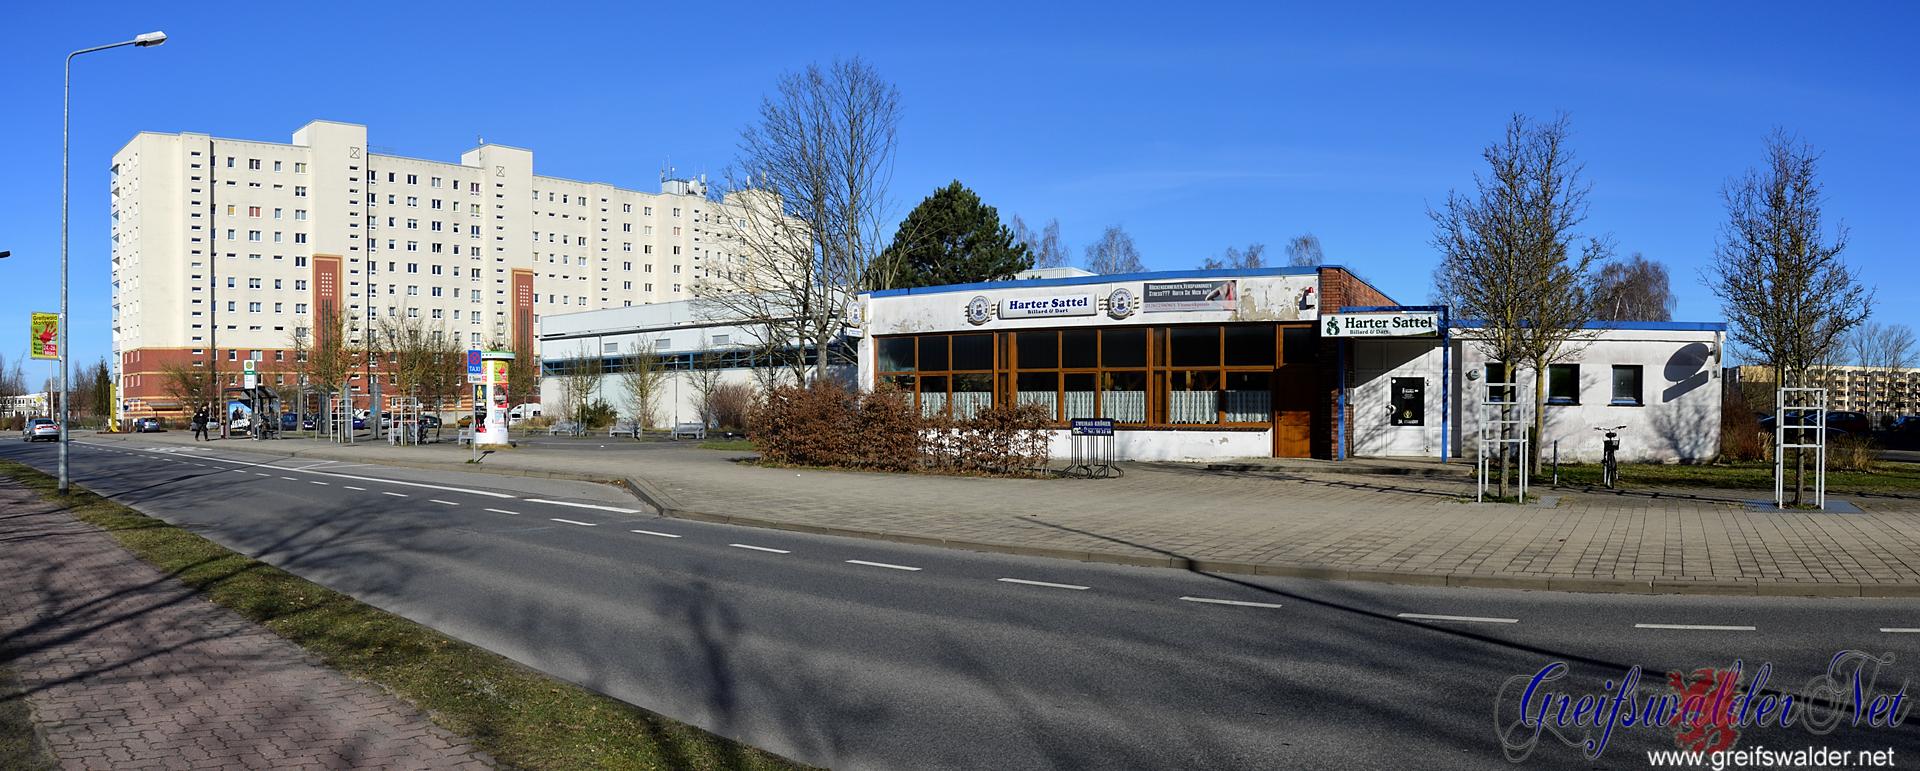 """Harter Sattel"" in Greifswald"